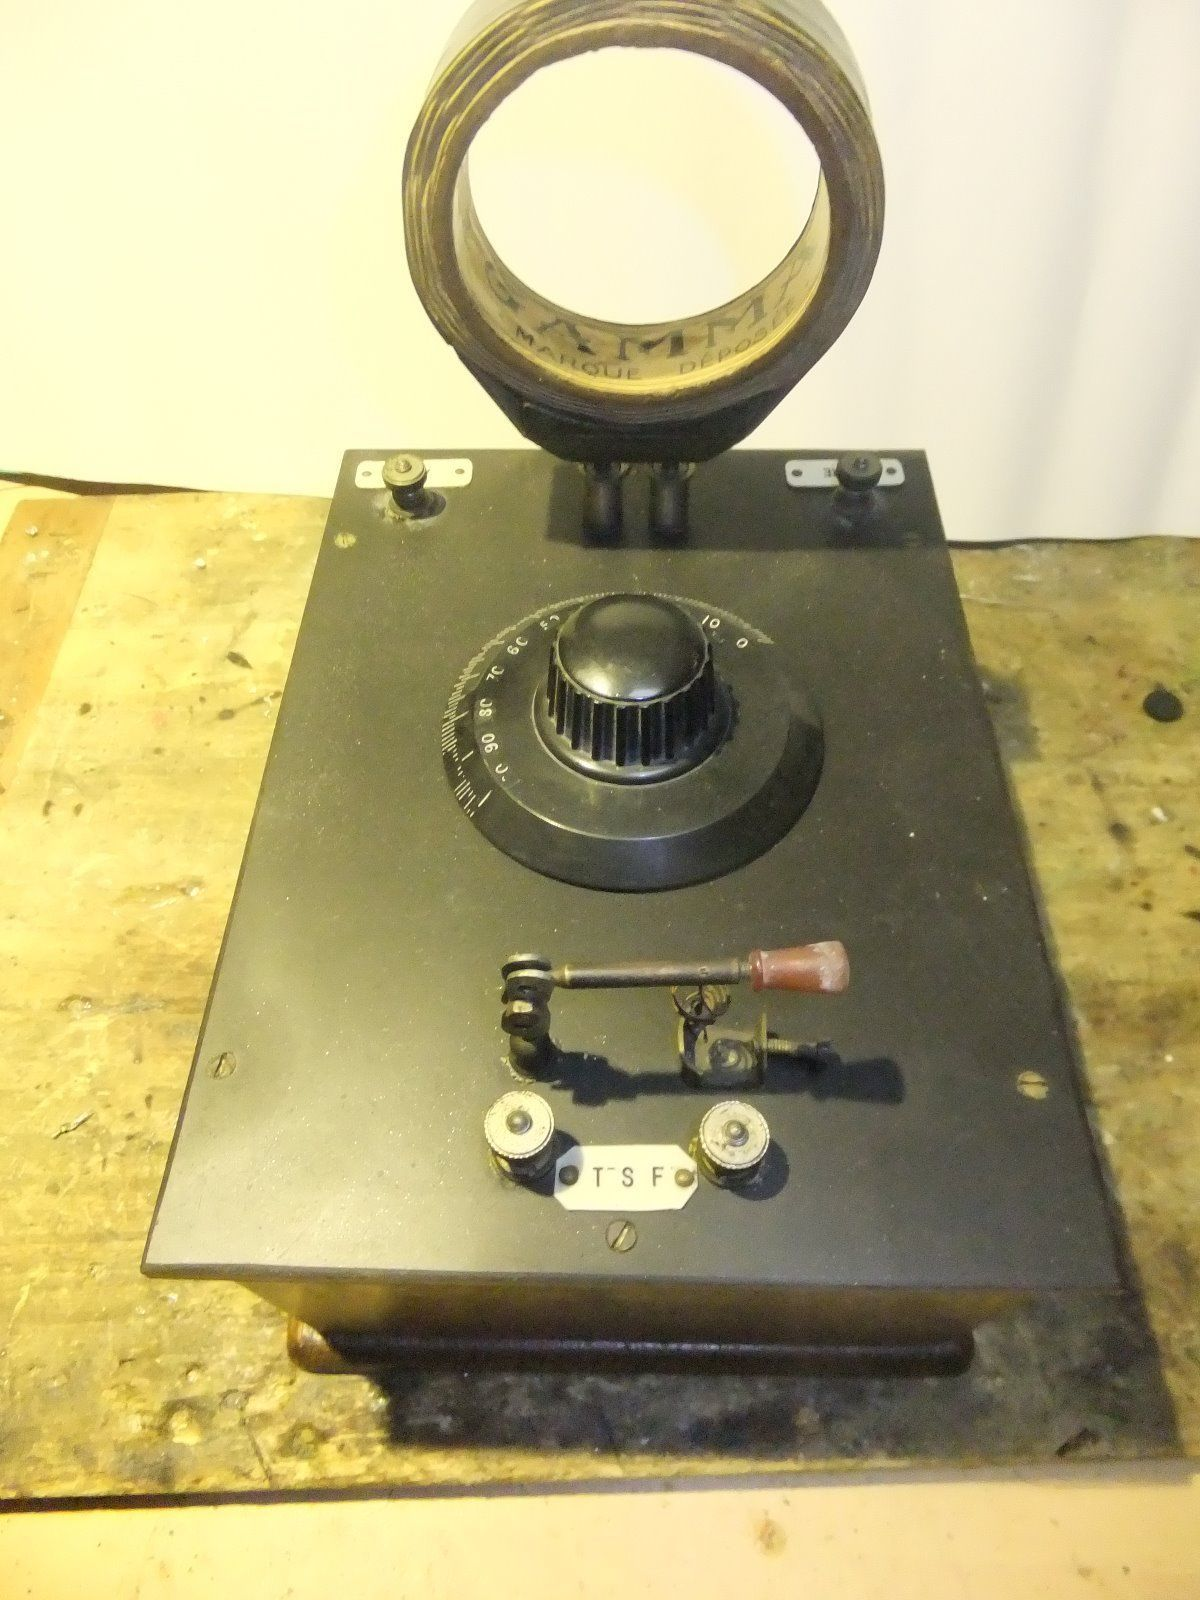 Detektor Receiver, 20er Jahre.